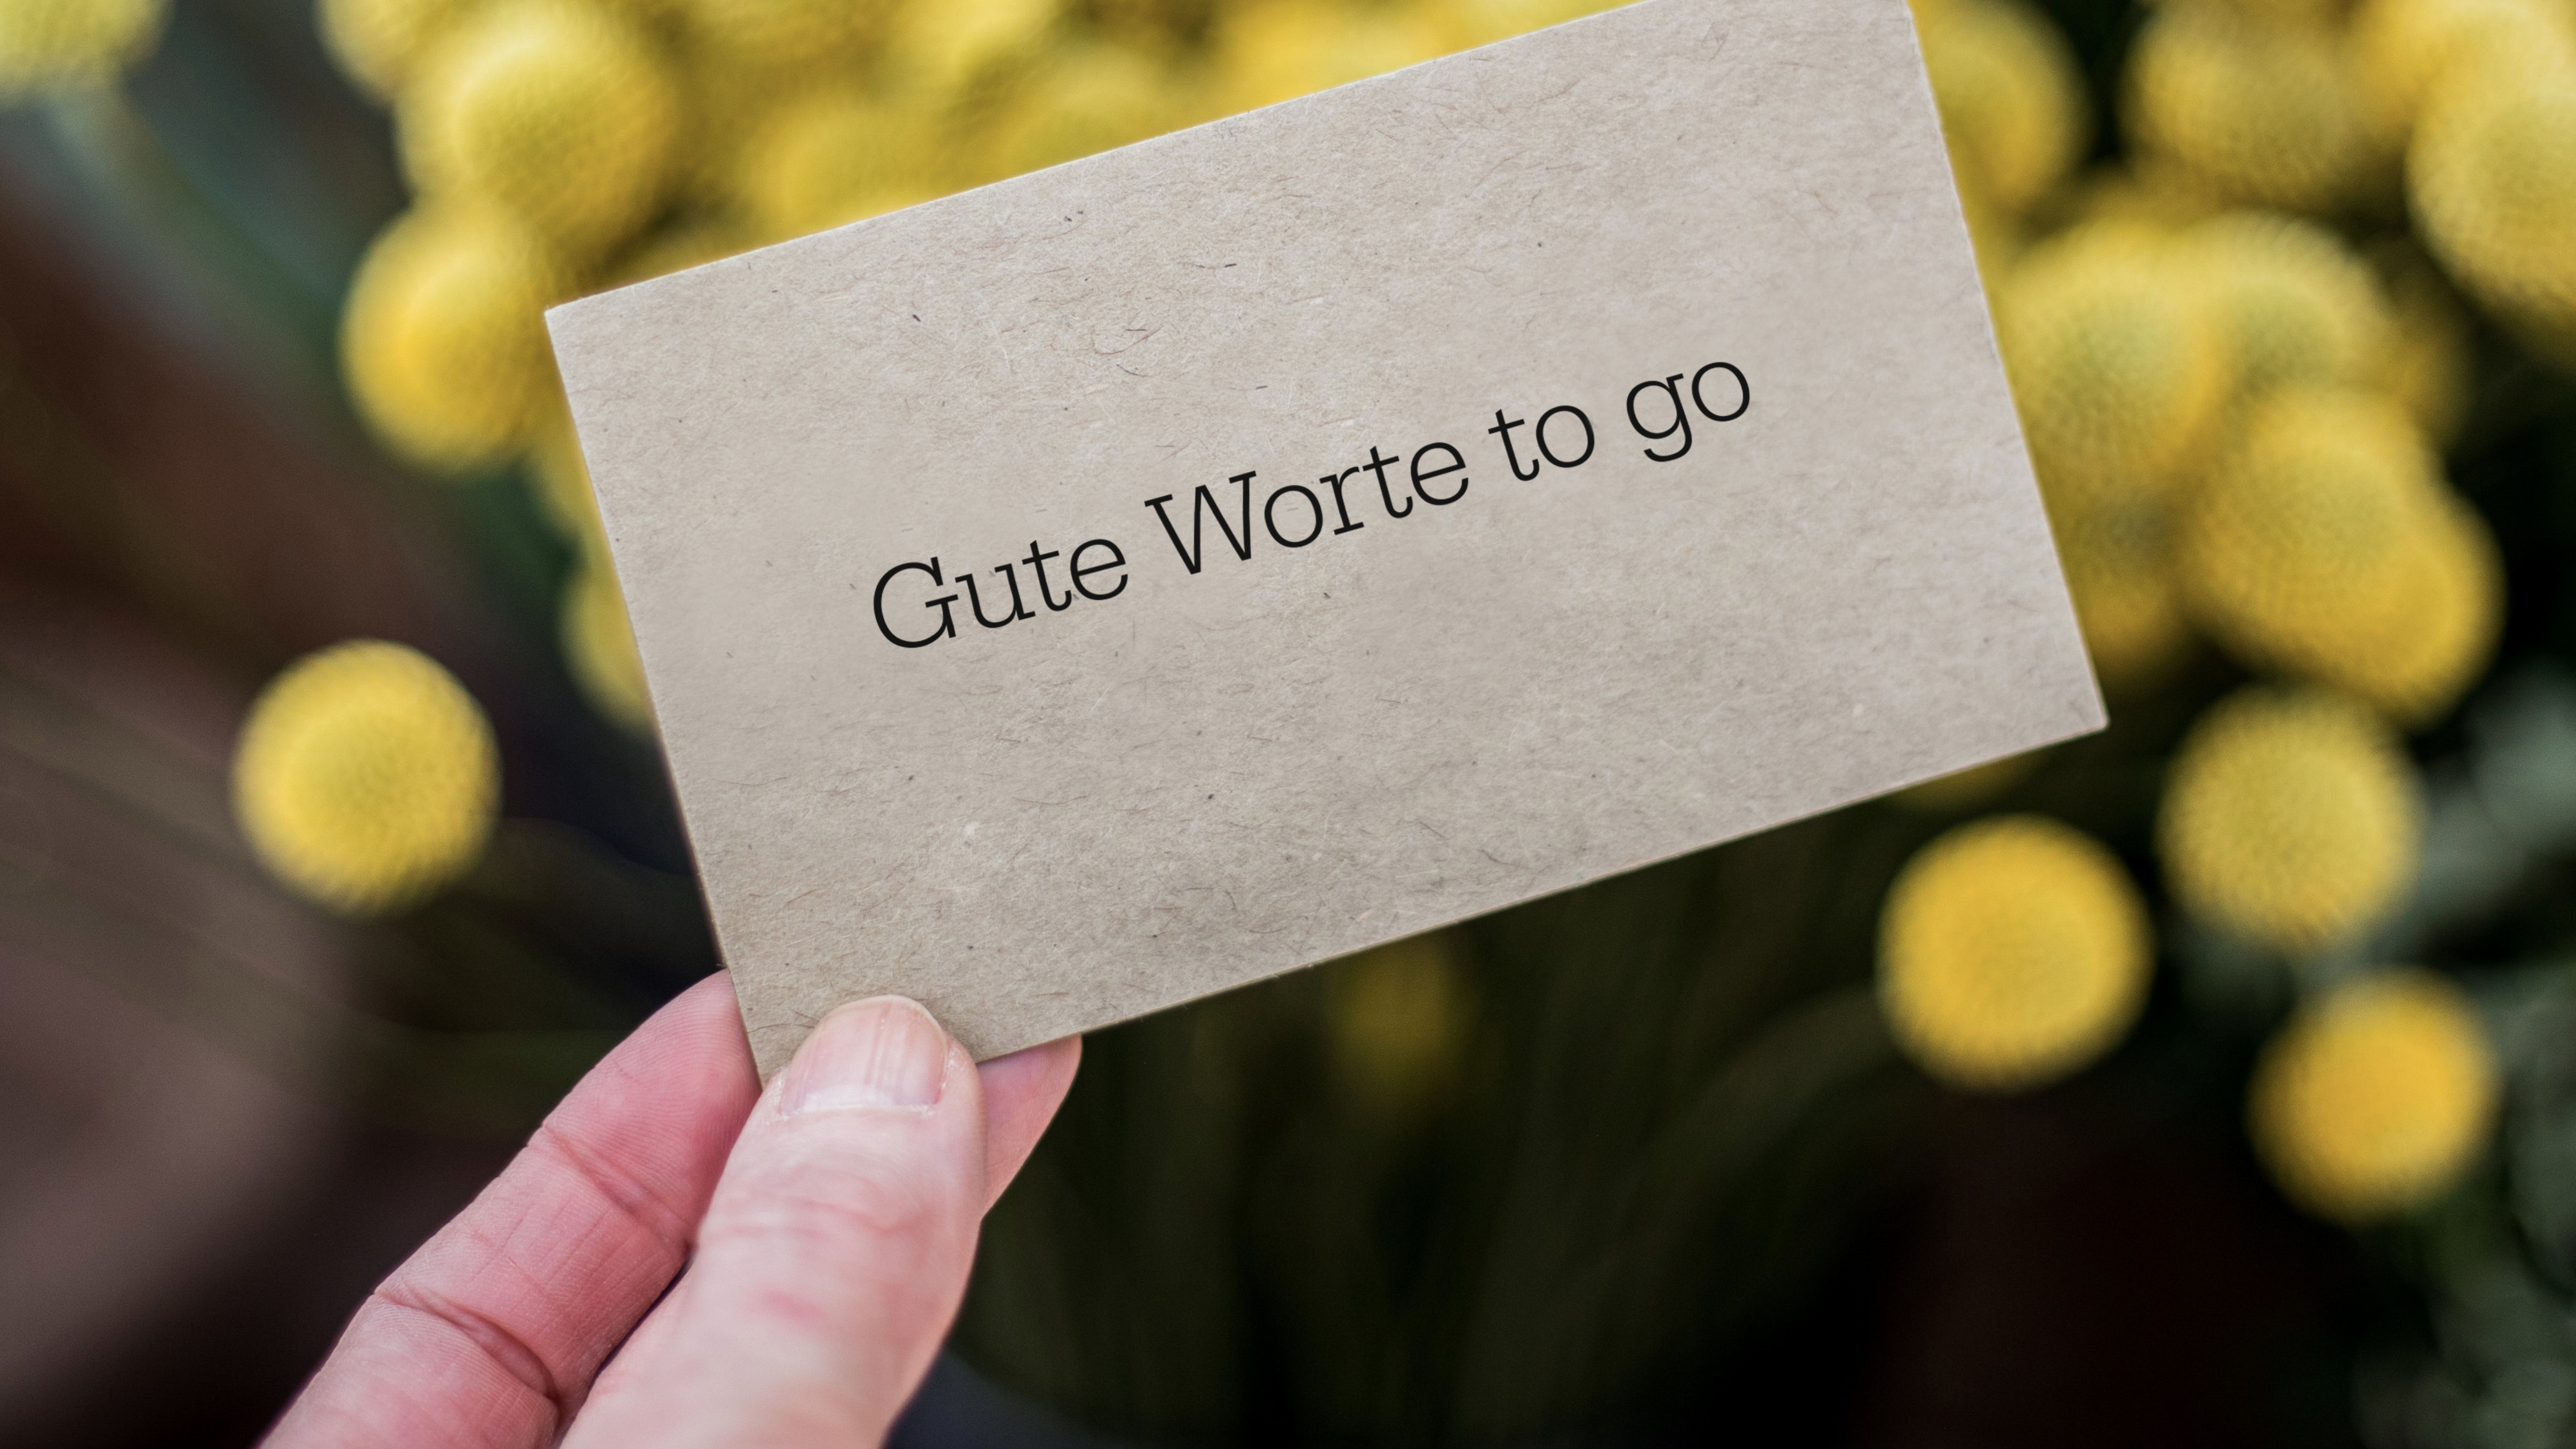 Gute Worte – to go